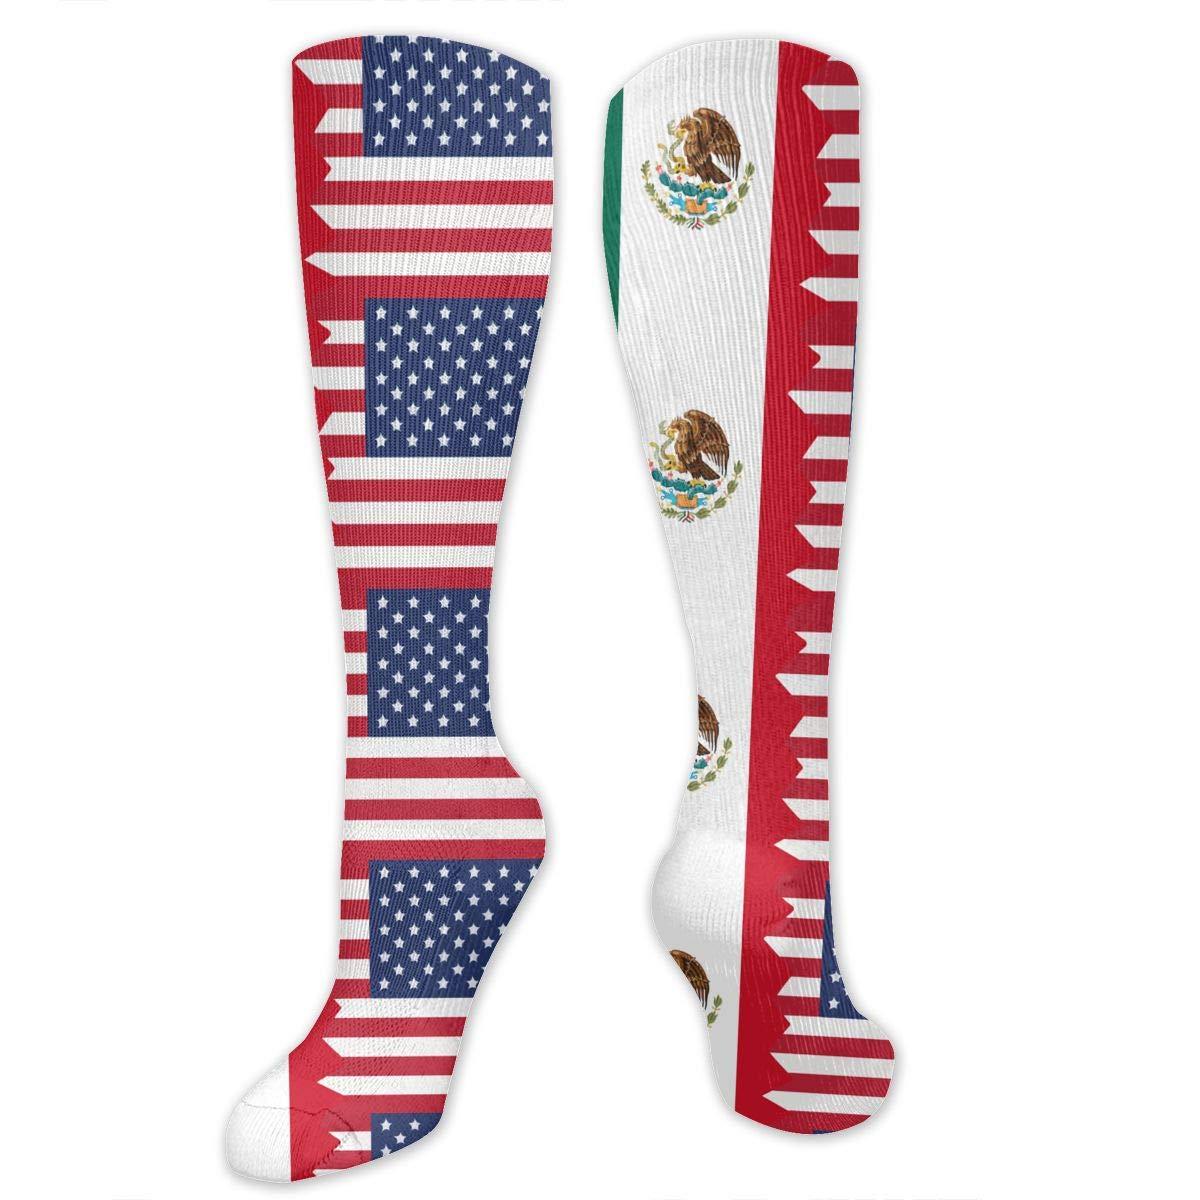 Unisex Mexico USA Flag Knee High Compression Thigh High Socks Soft Socks